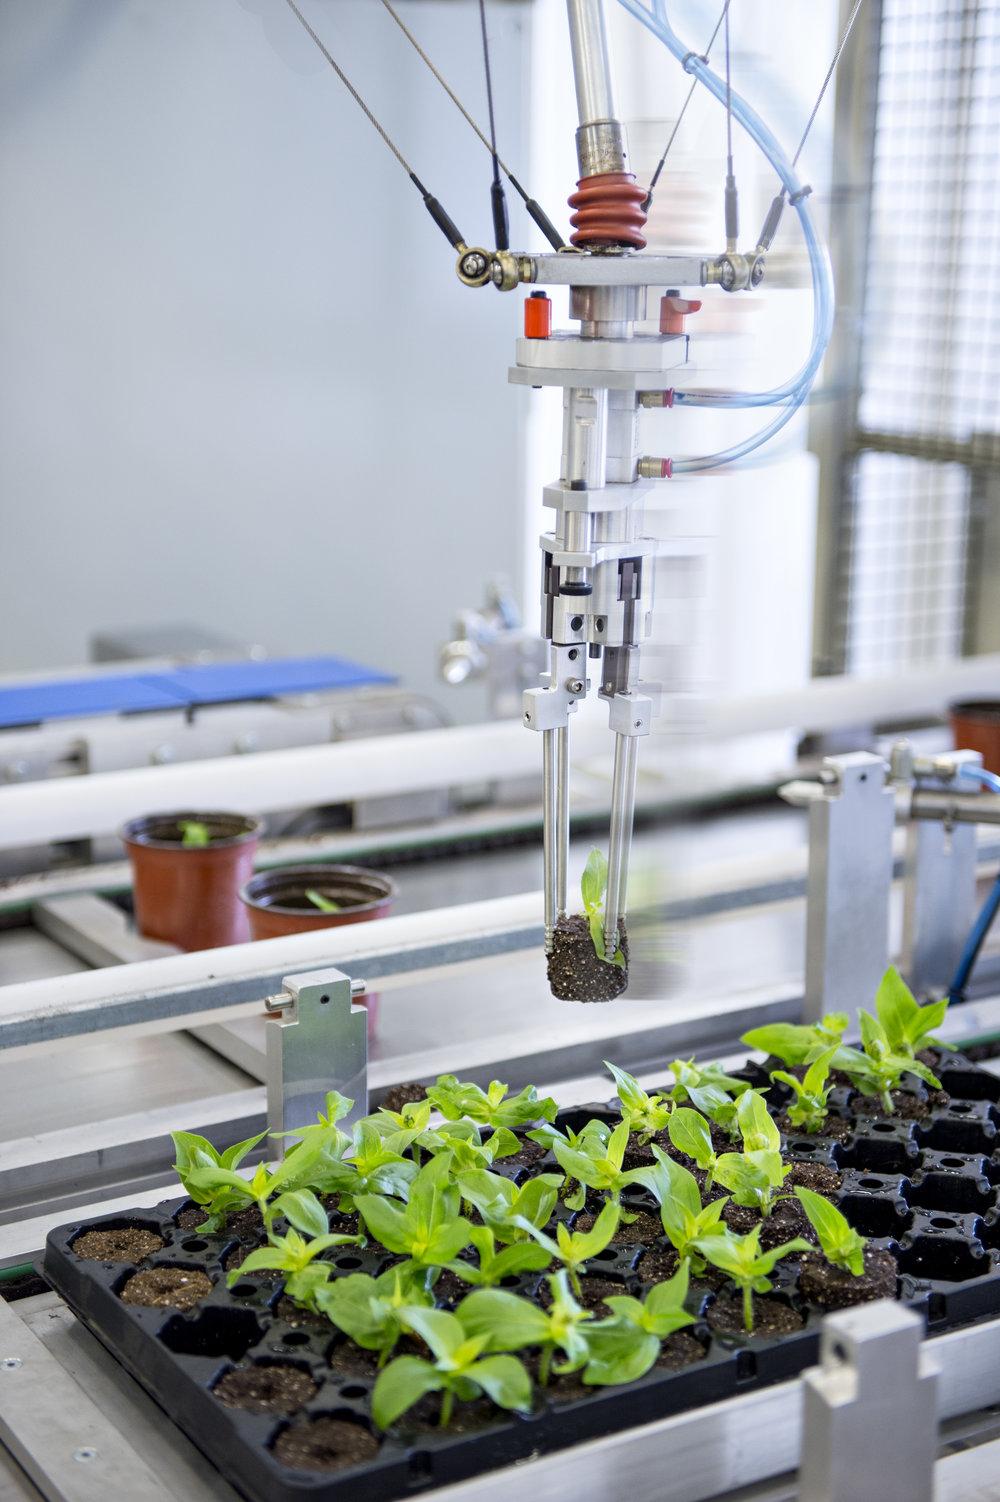 Marta-Hewson-industrial-photography-greenhouse-robotics-Kitestring-Vineland-Research.jpg